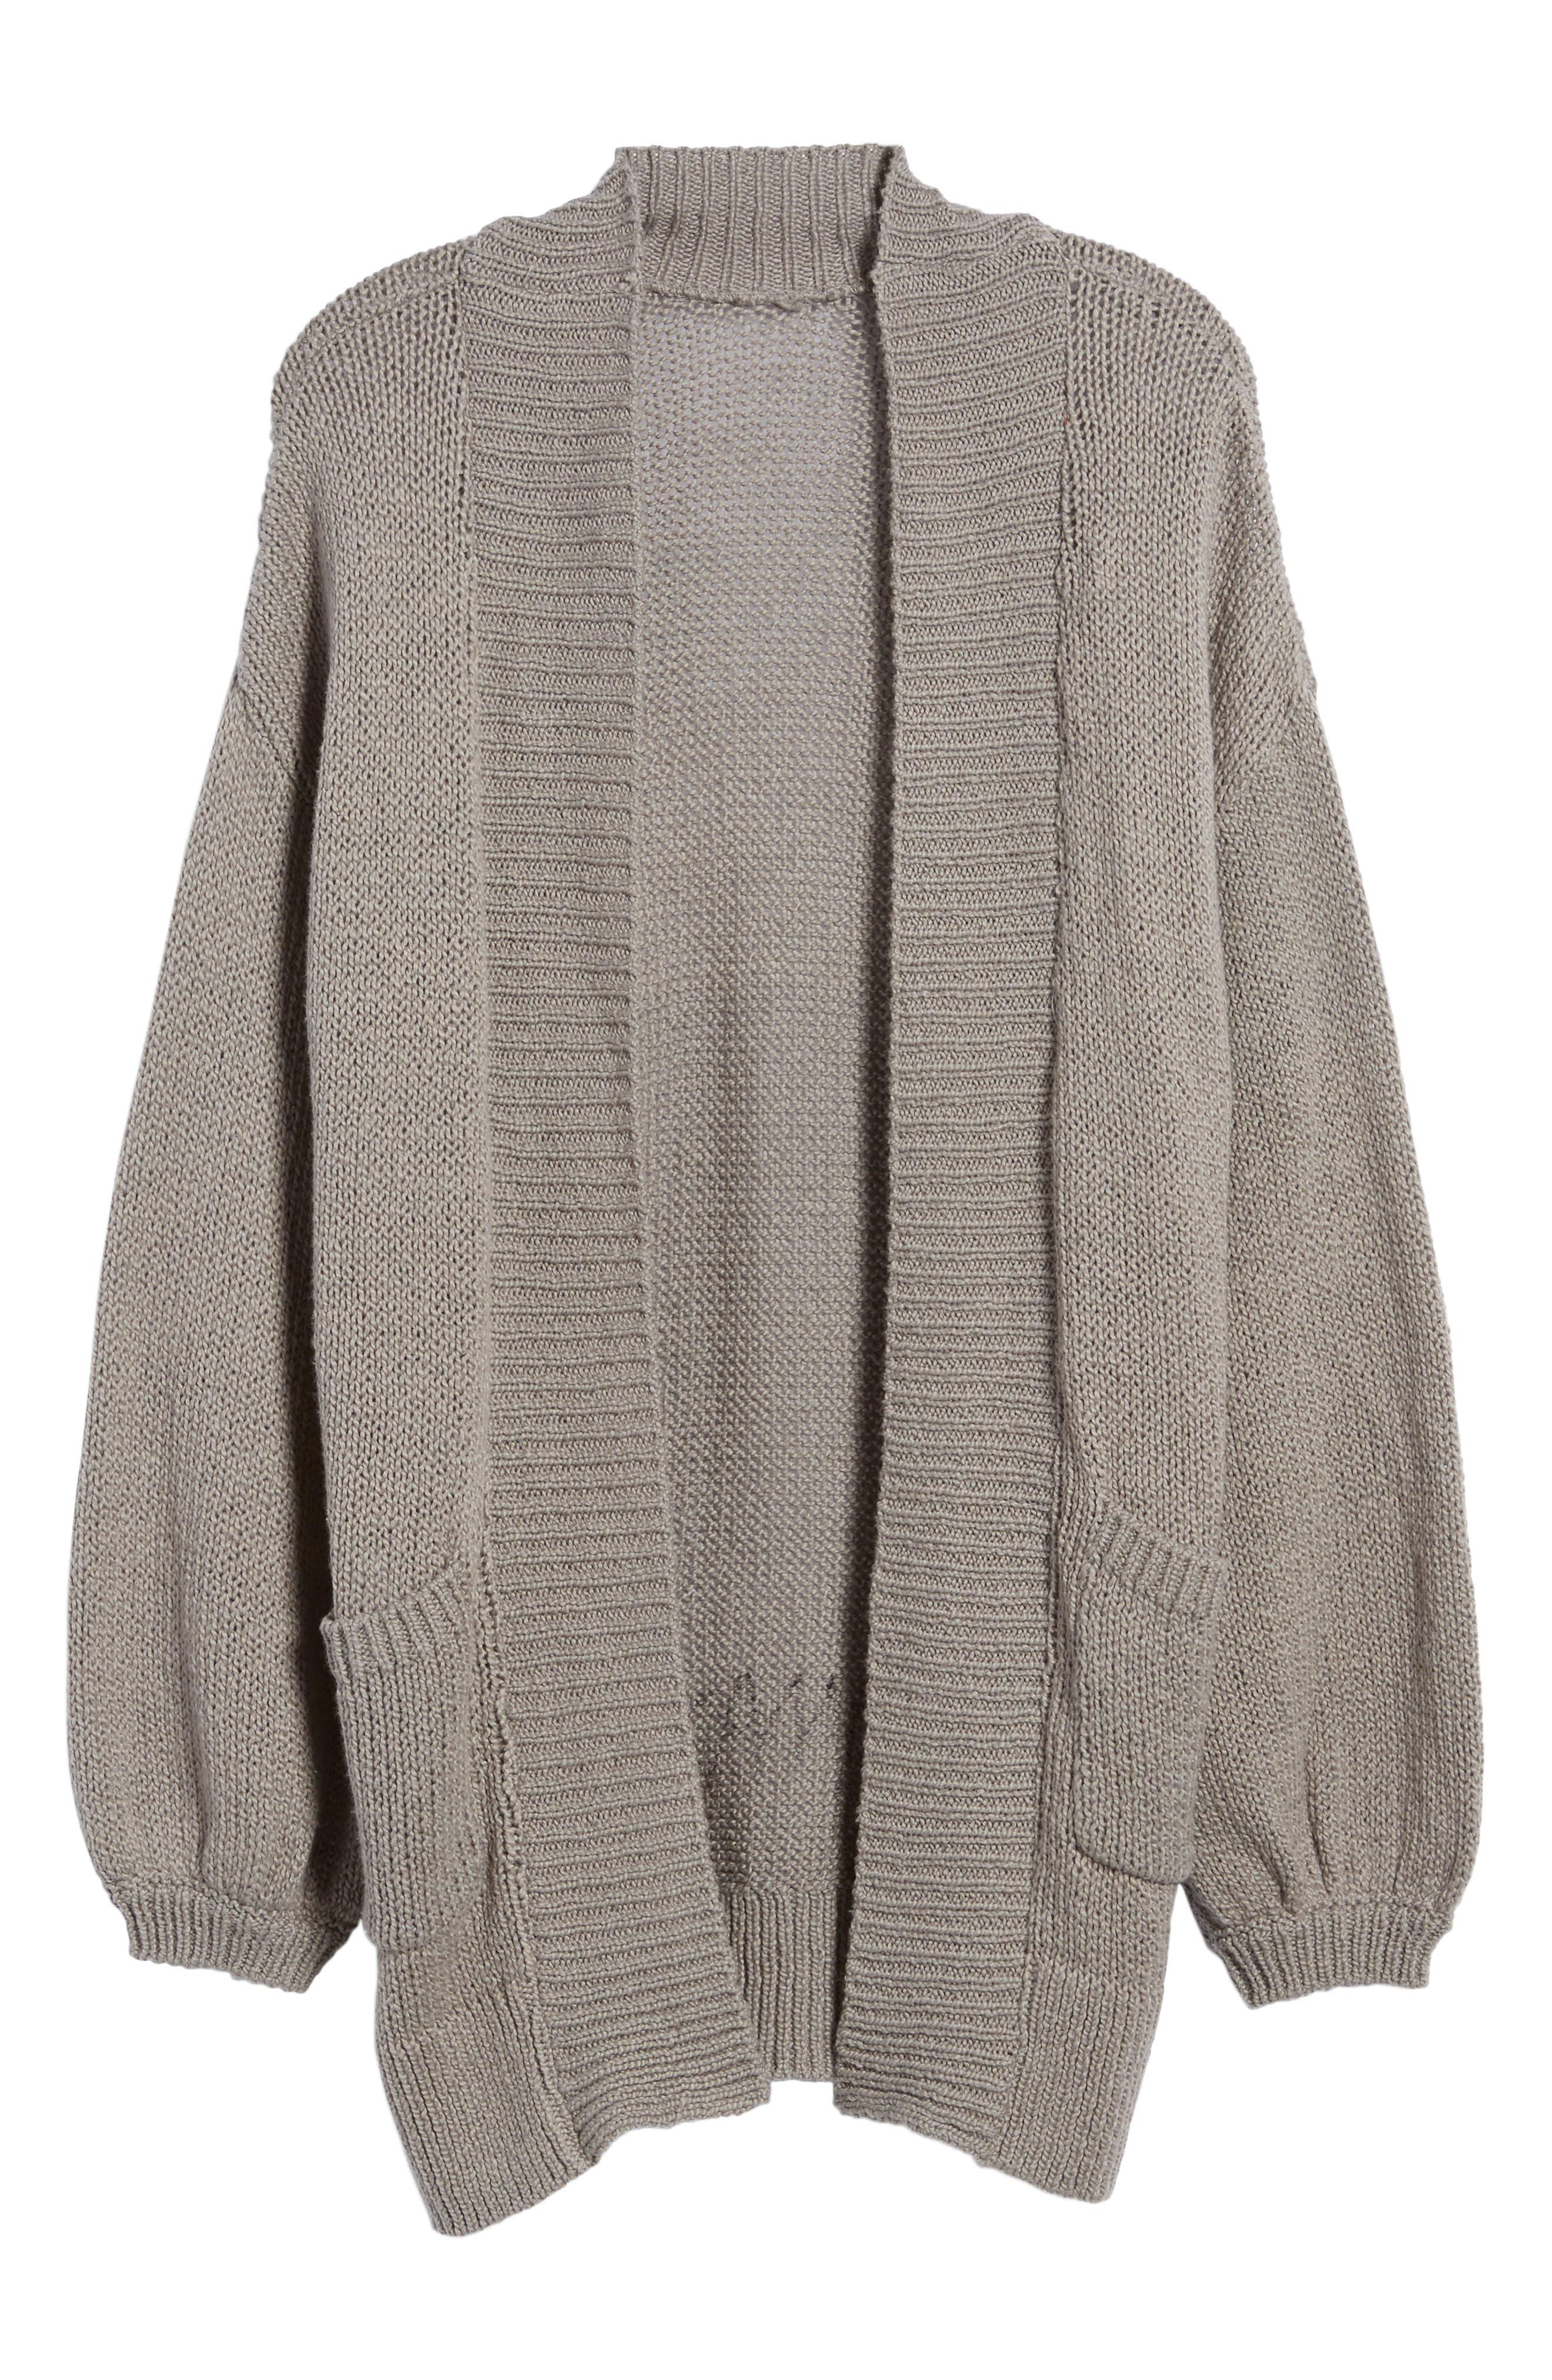 Blouson Sleeve Knit Cardigan,                             Alternate thumbnail 6, color,                             030